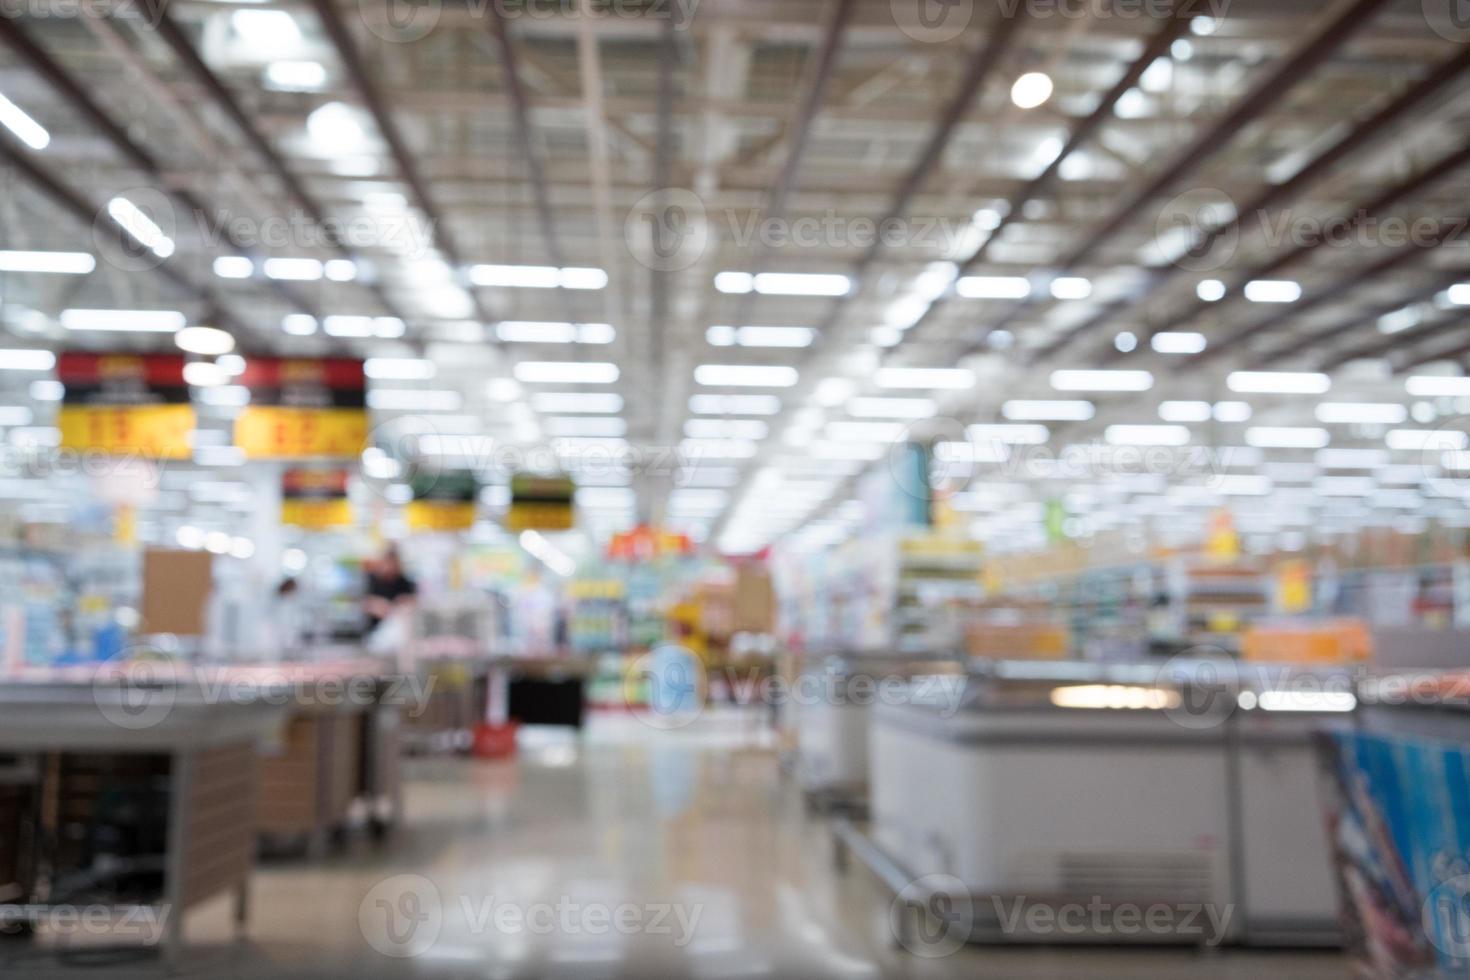 suddig livsmedelsbutik bakgrund foto